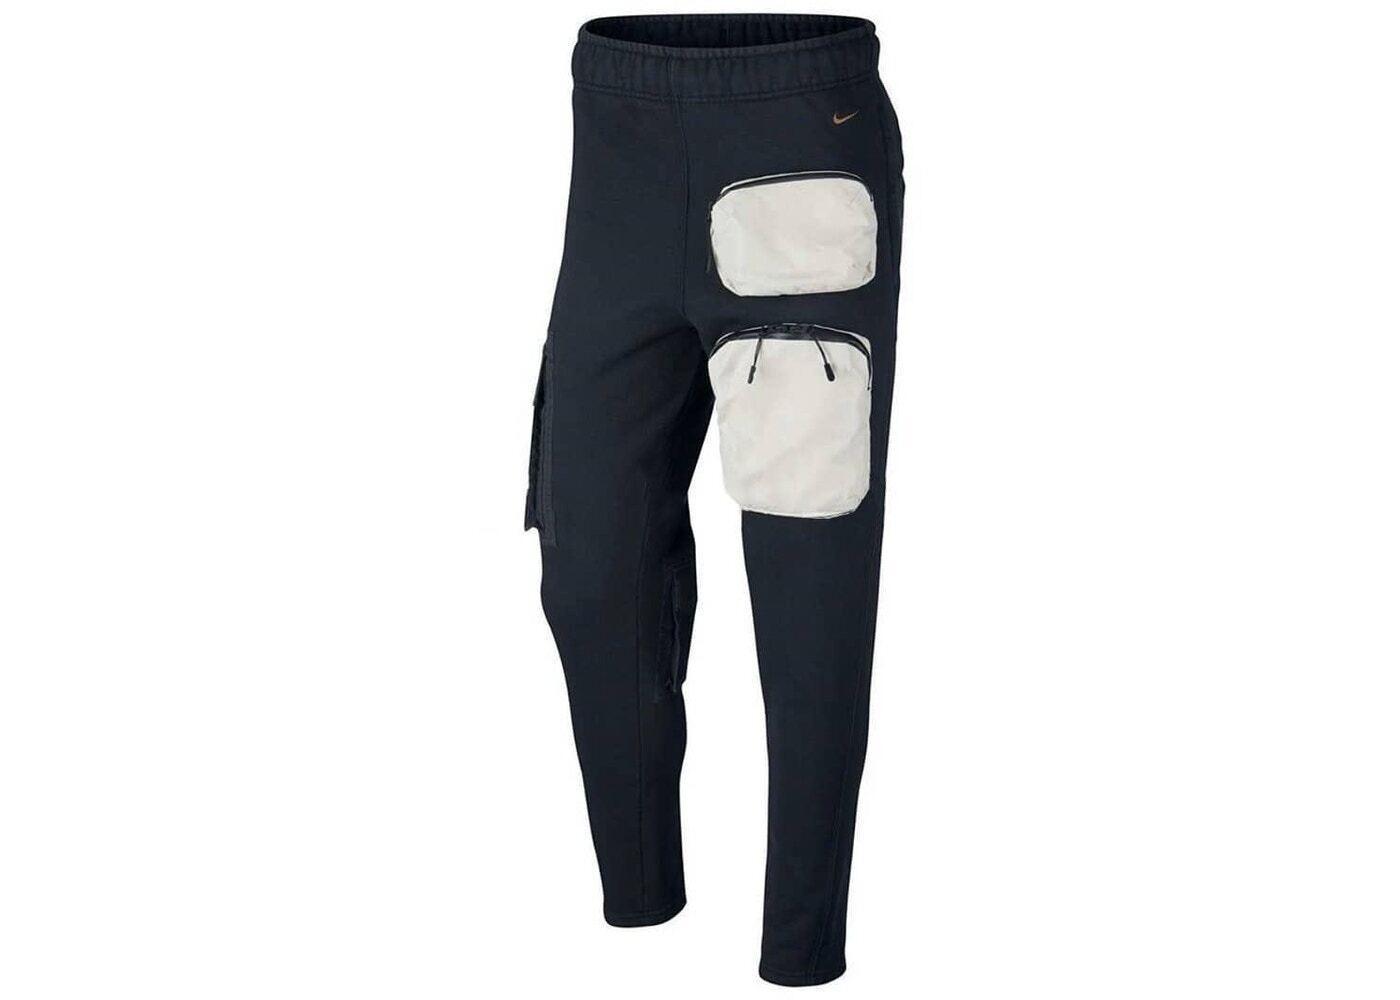 Travis Scott × Nike NRG AG Utility Sweatpants Blackの写真